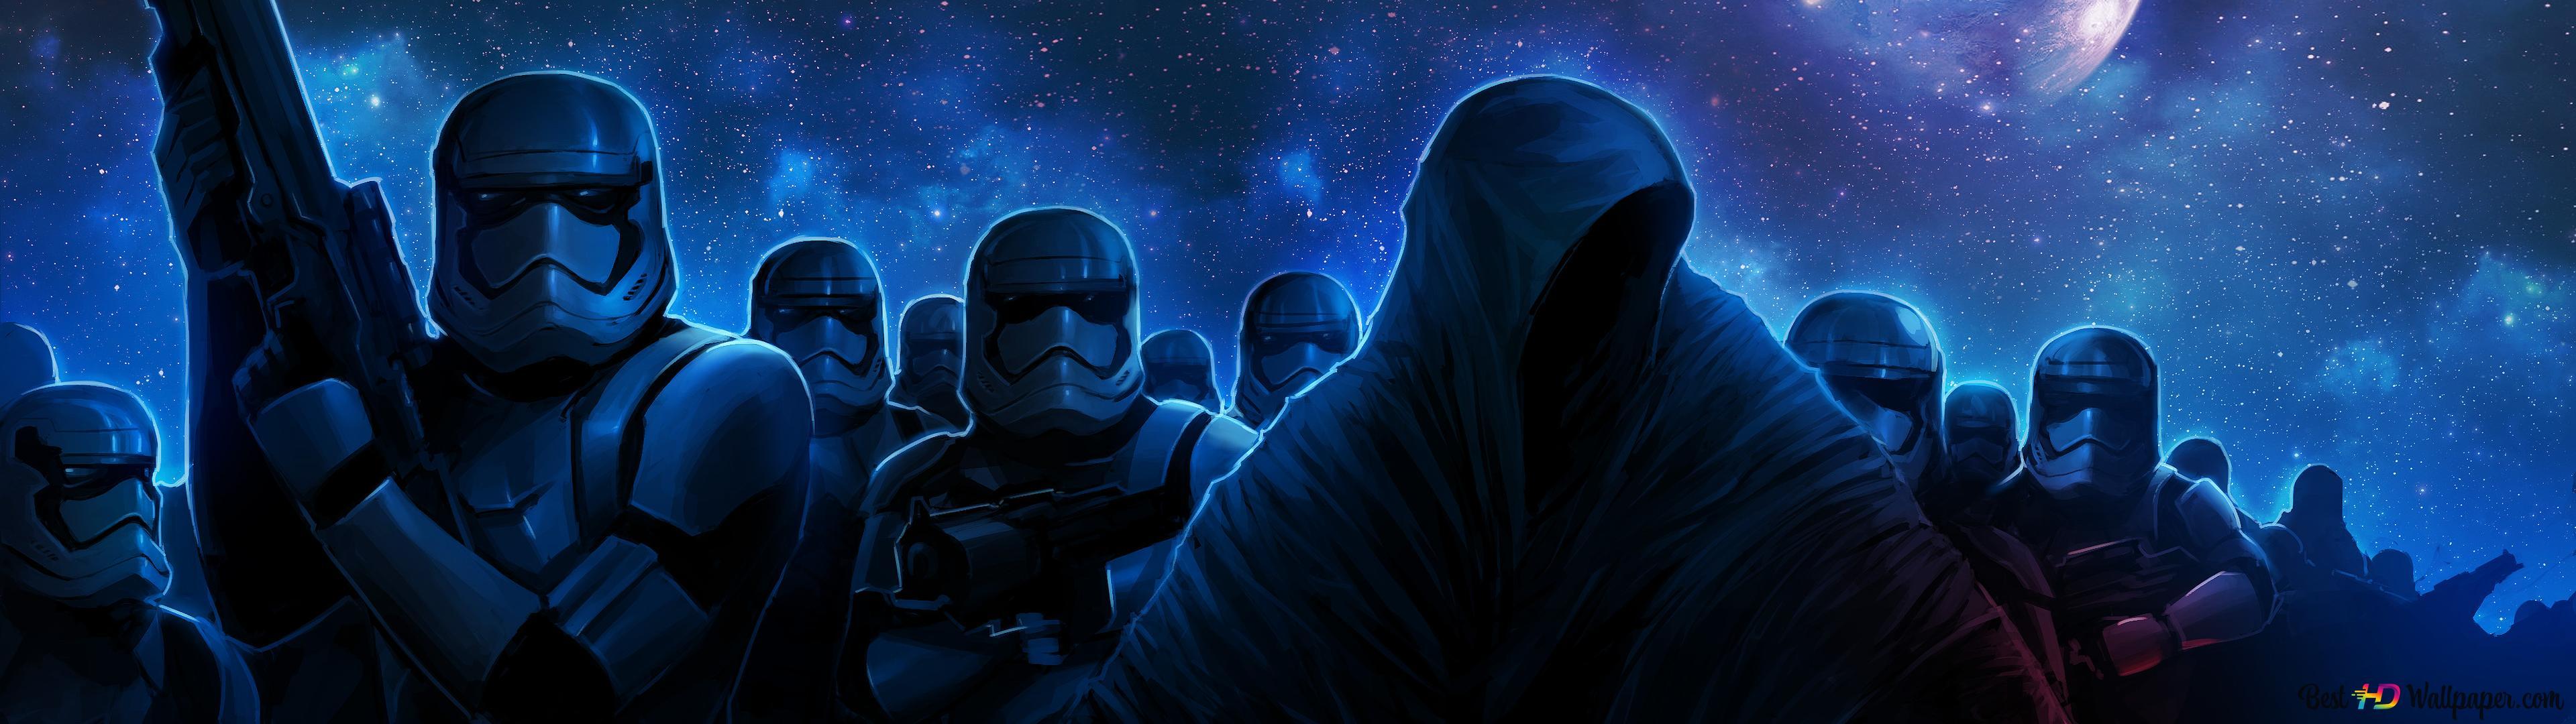 Star Wars Episode Vii The Force Awakens Stormtrooper Hd Wallpaper Download